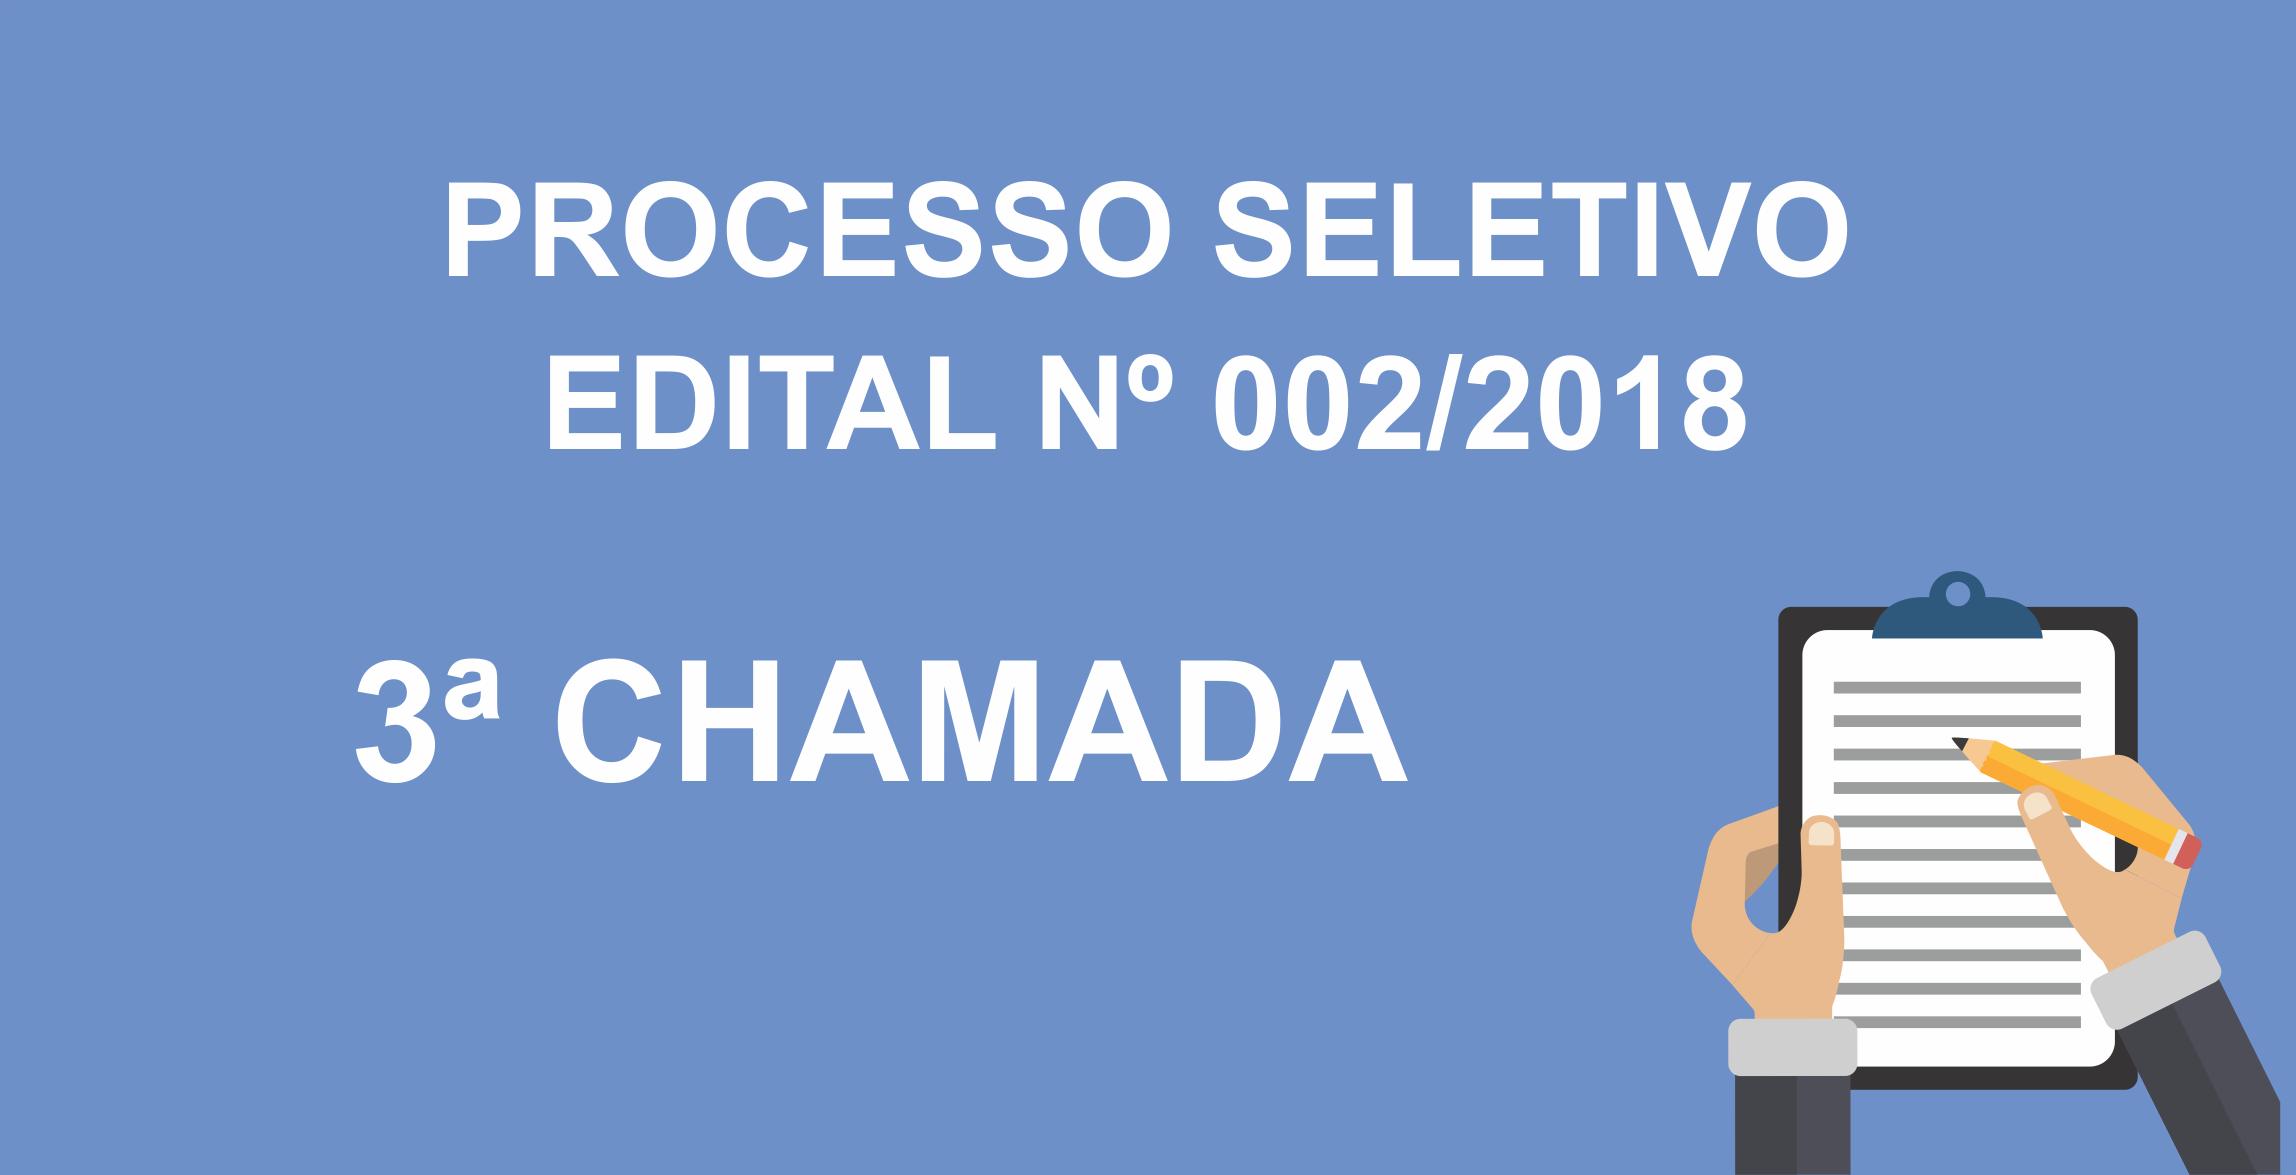 3 CHAMADA 002